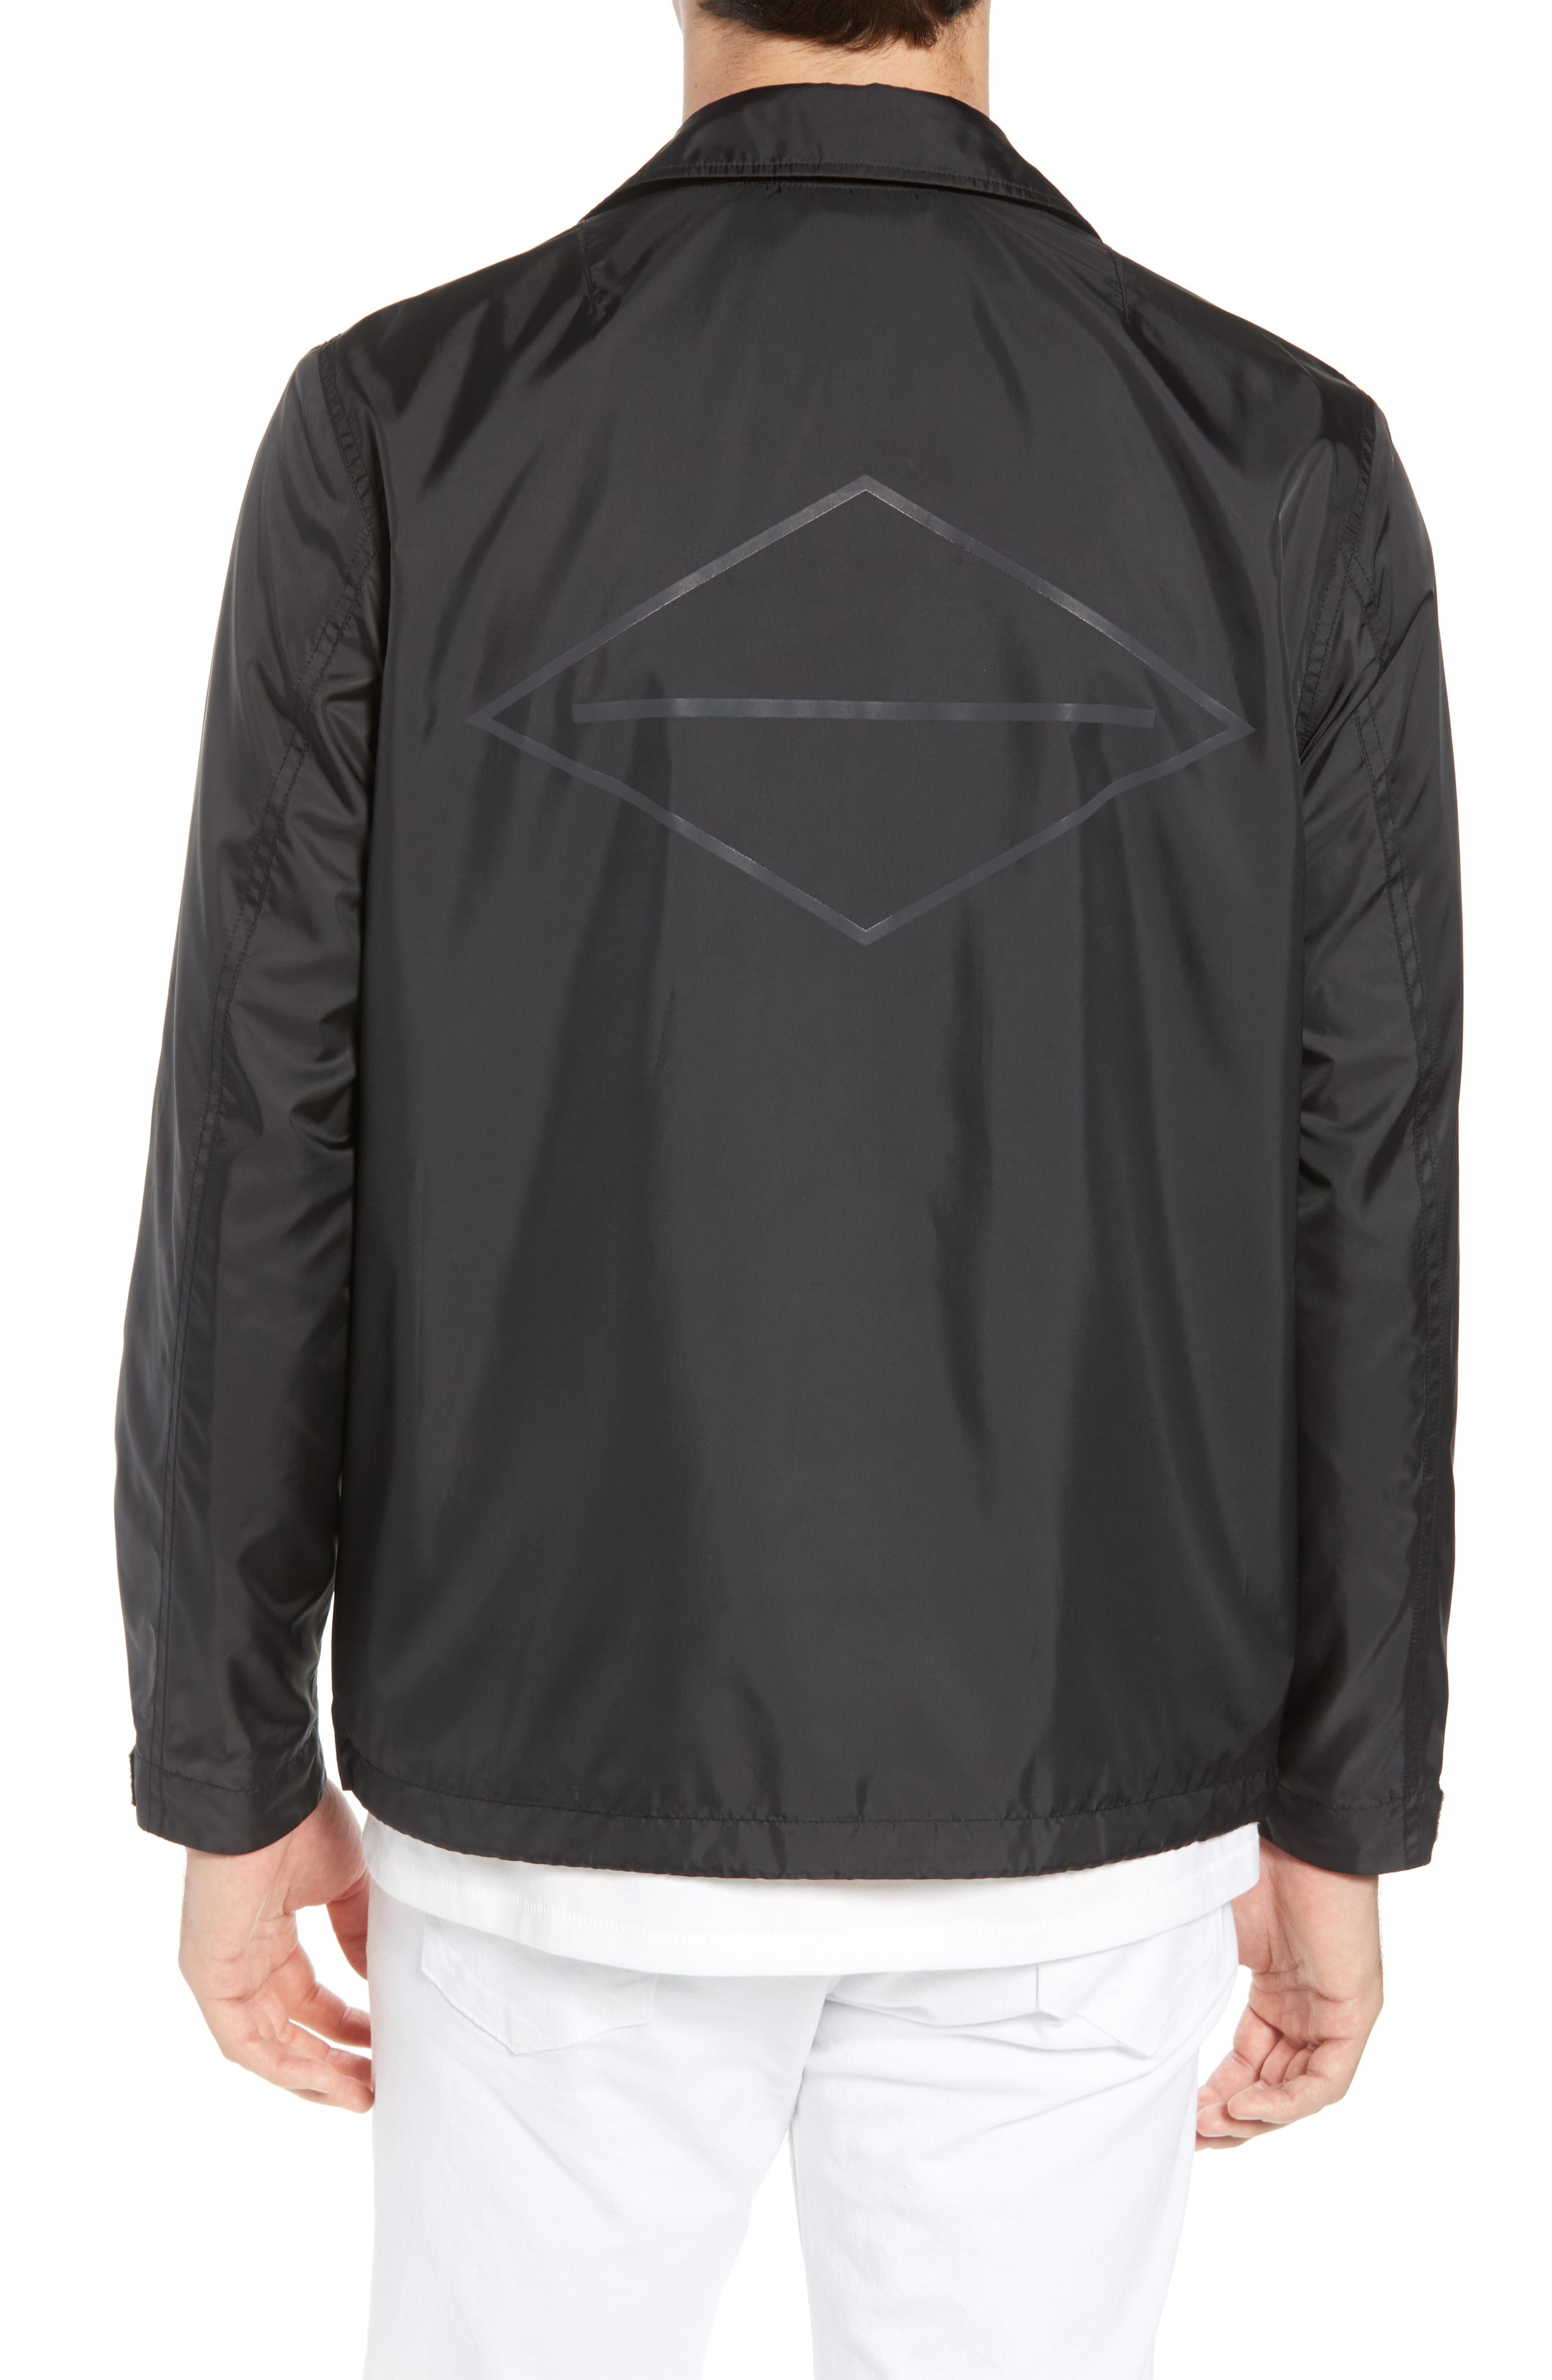 Coaches Jacket,                             Alternate thumbnail 2, color,                             Black